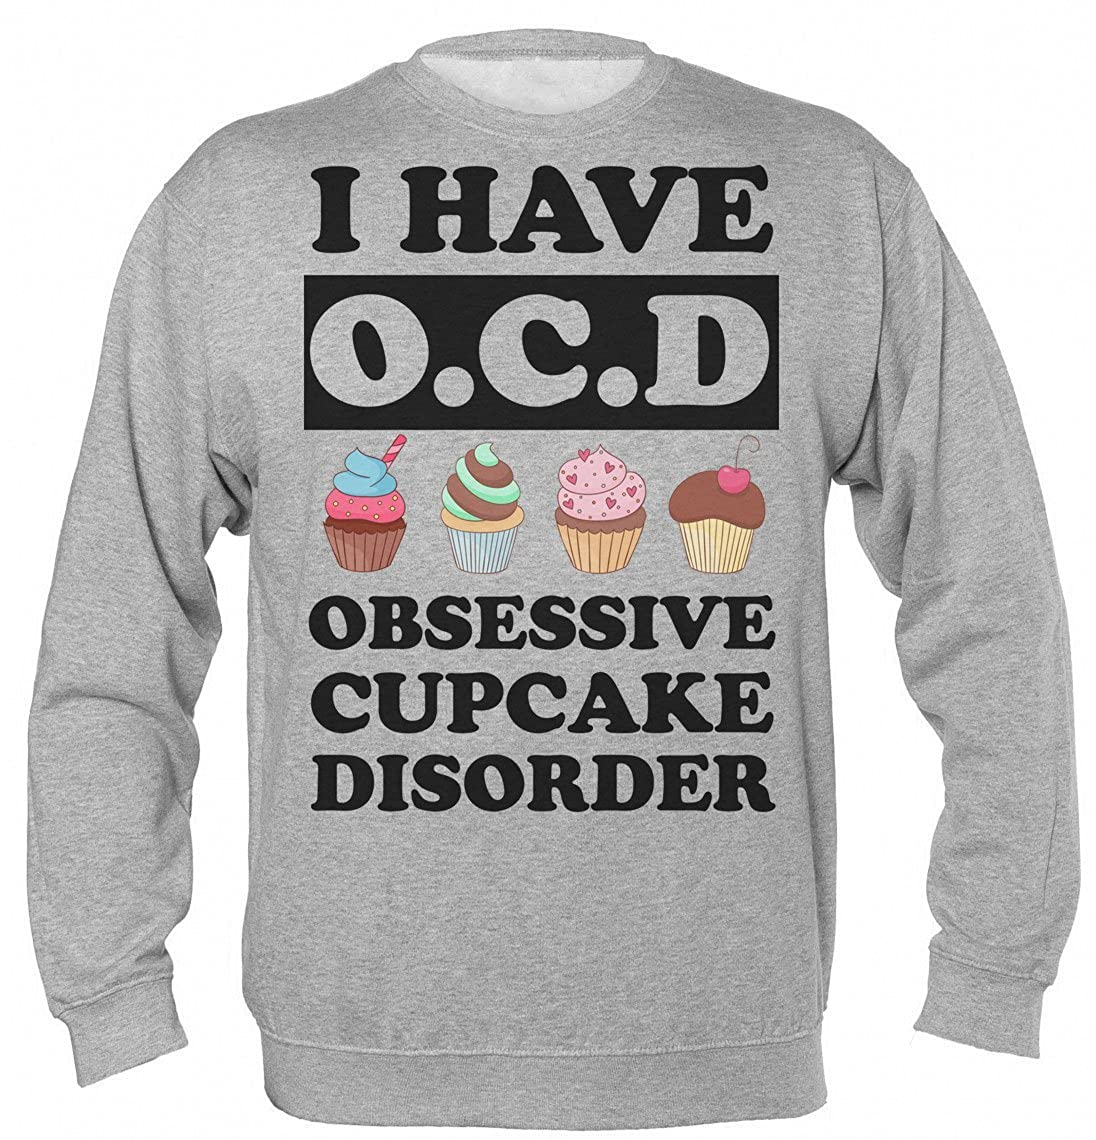 I Have O.C.D. Obsessive Cupcake Disorder Unisex Sudadera: Amazon.es: Ropa y accesorios